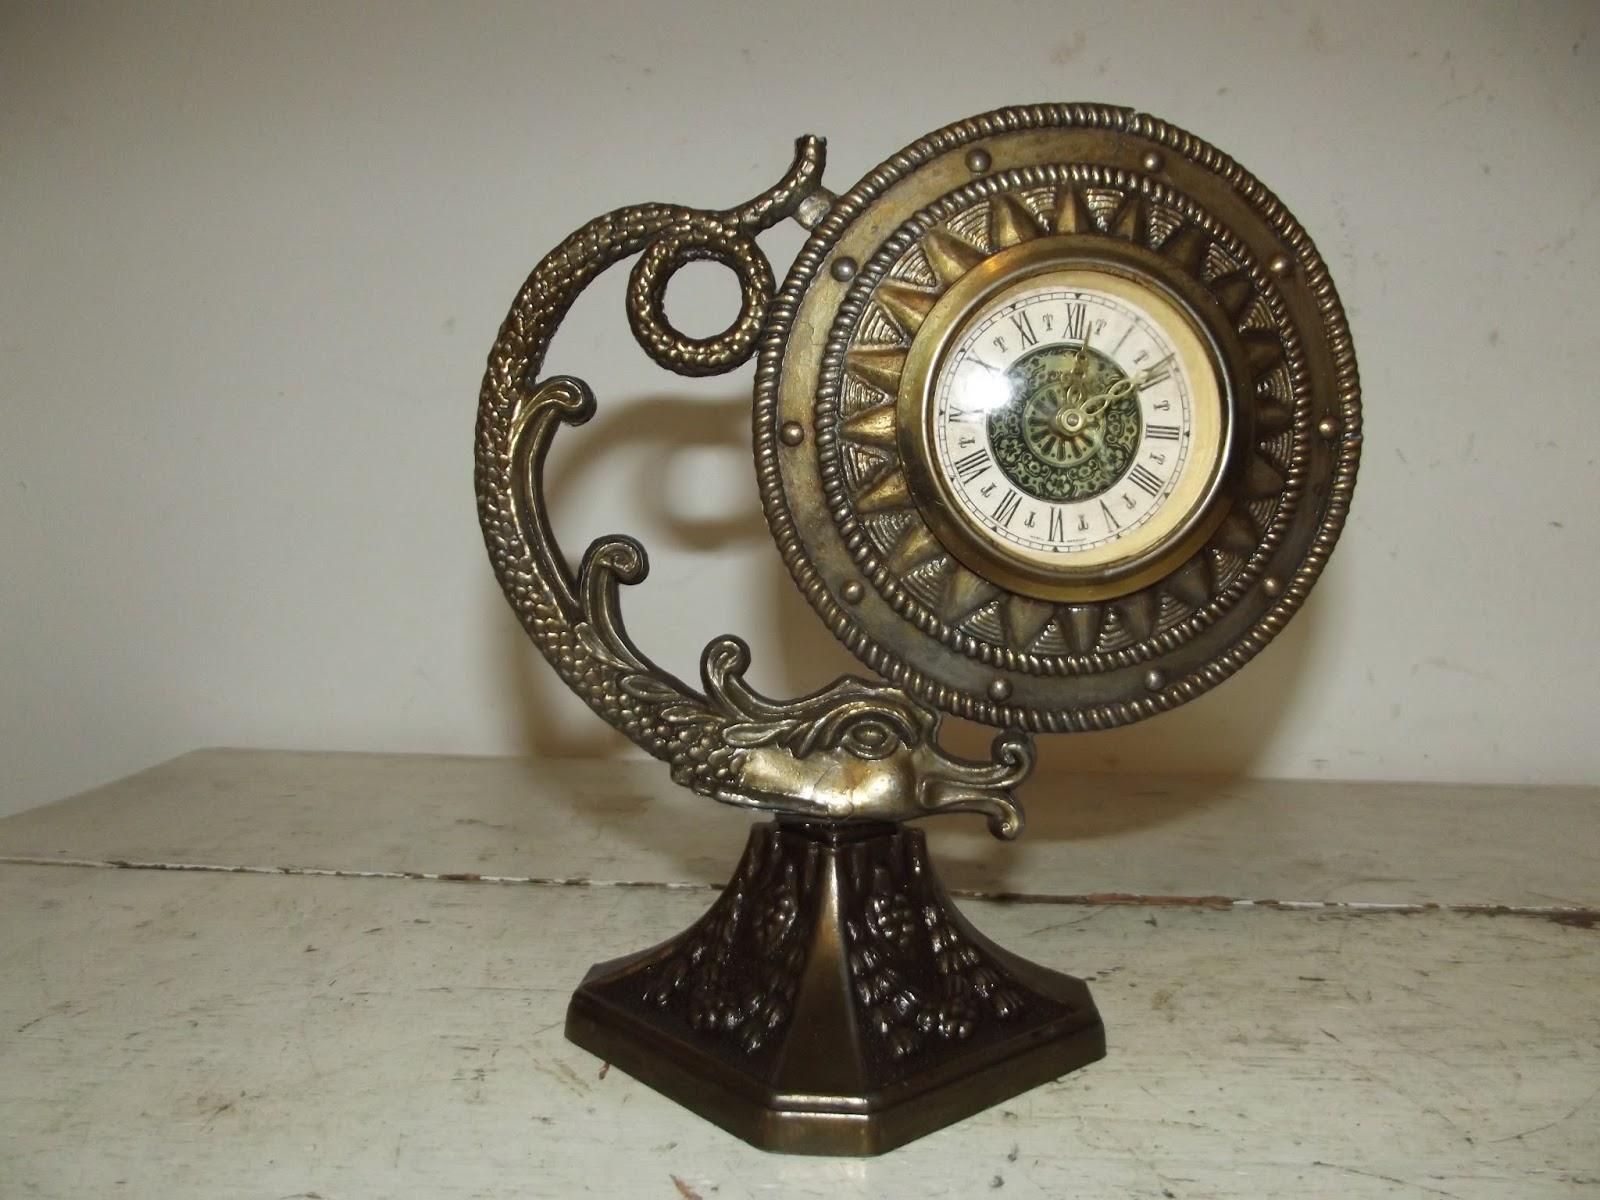 petite pendule pendulette decor dauphin dragon vintage horloge art deco. Black Bedroom Furniture Sets. Home Design Ideas